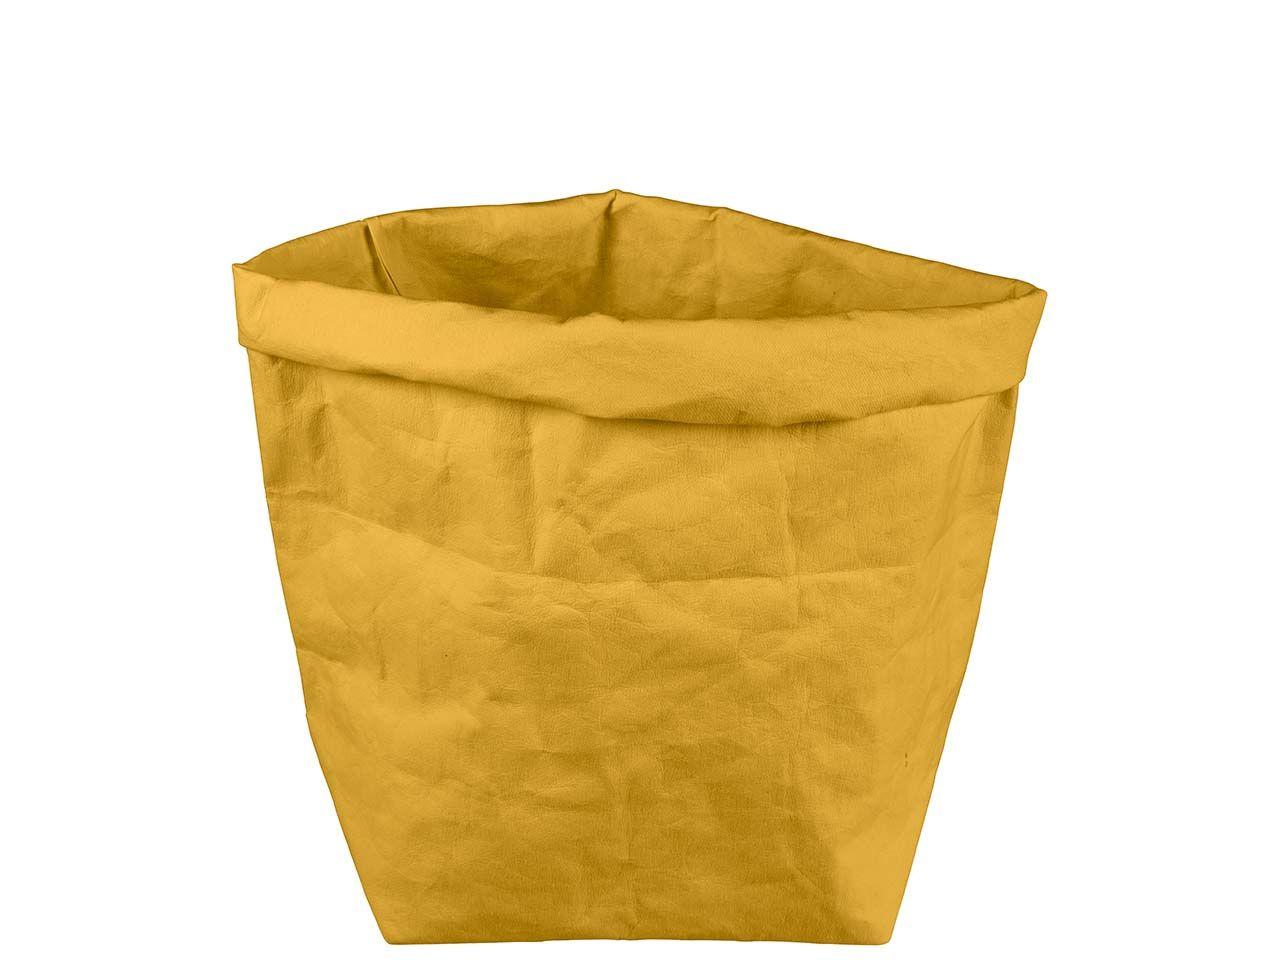 "Krempelbox ""STUFF"" aus Papyr, Gr. XL, banana 11428 banana"